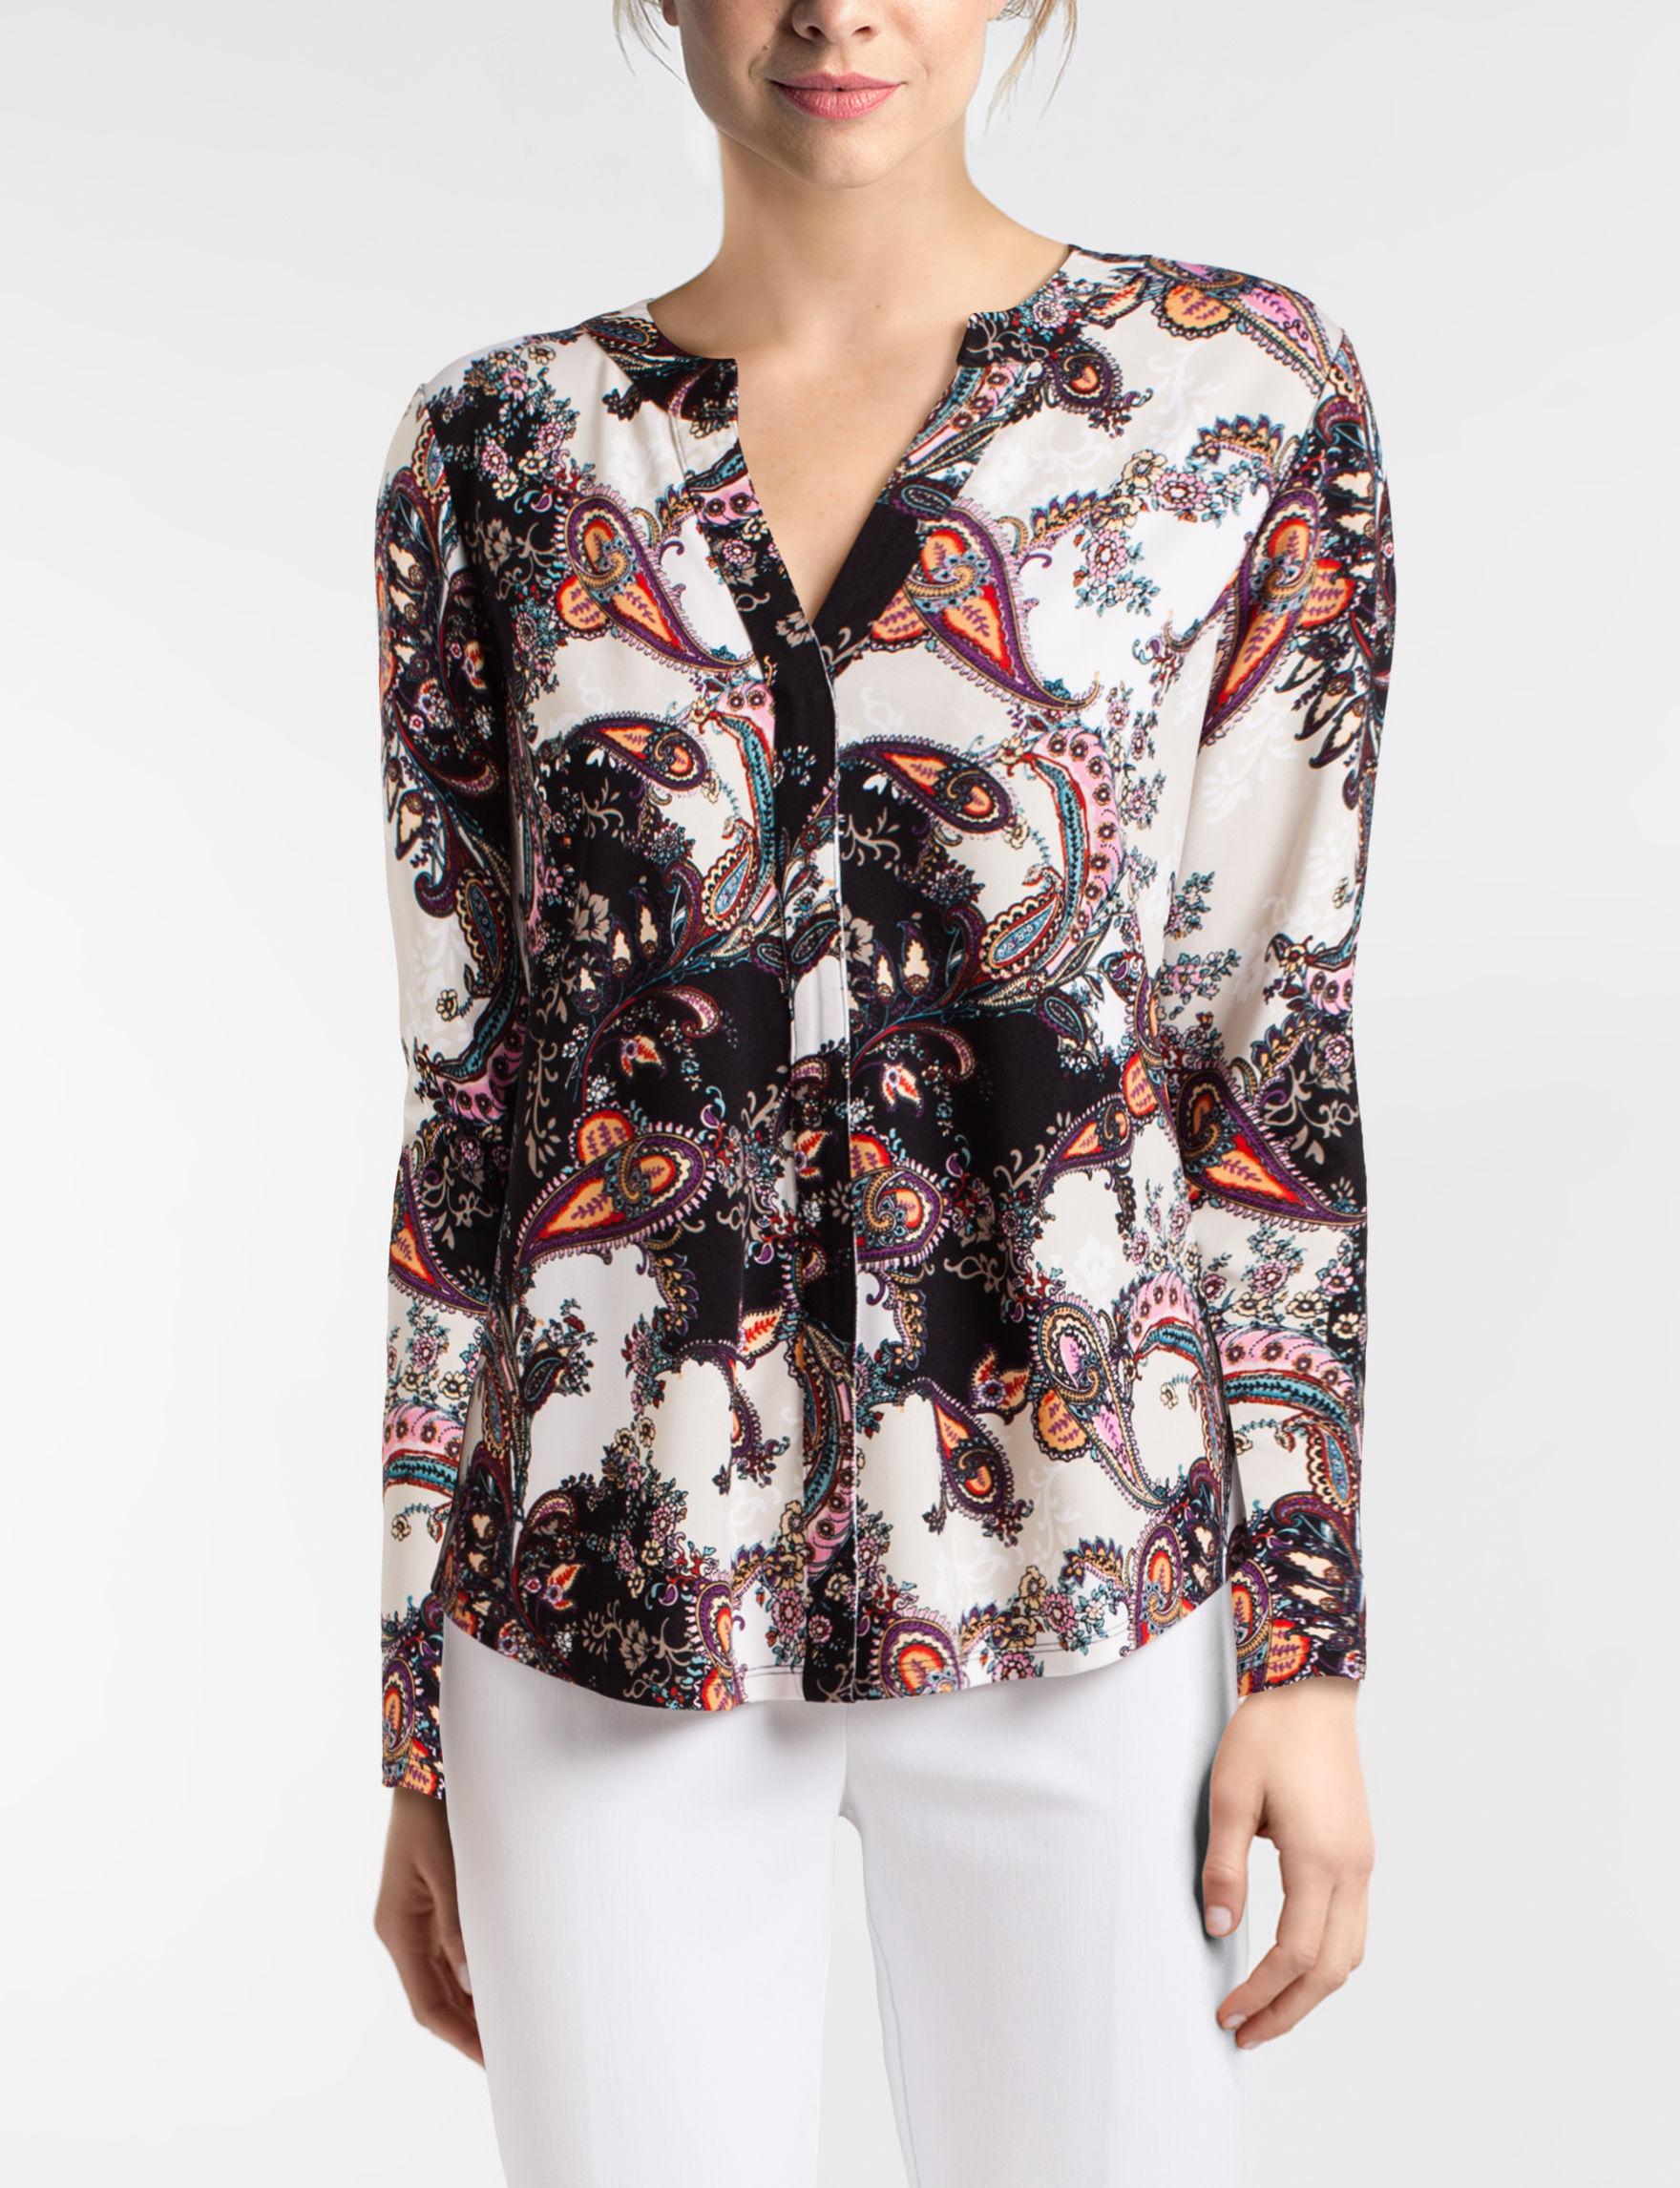 Valerie Stevens Black / Pink Shirts & Blouses